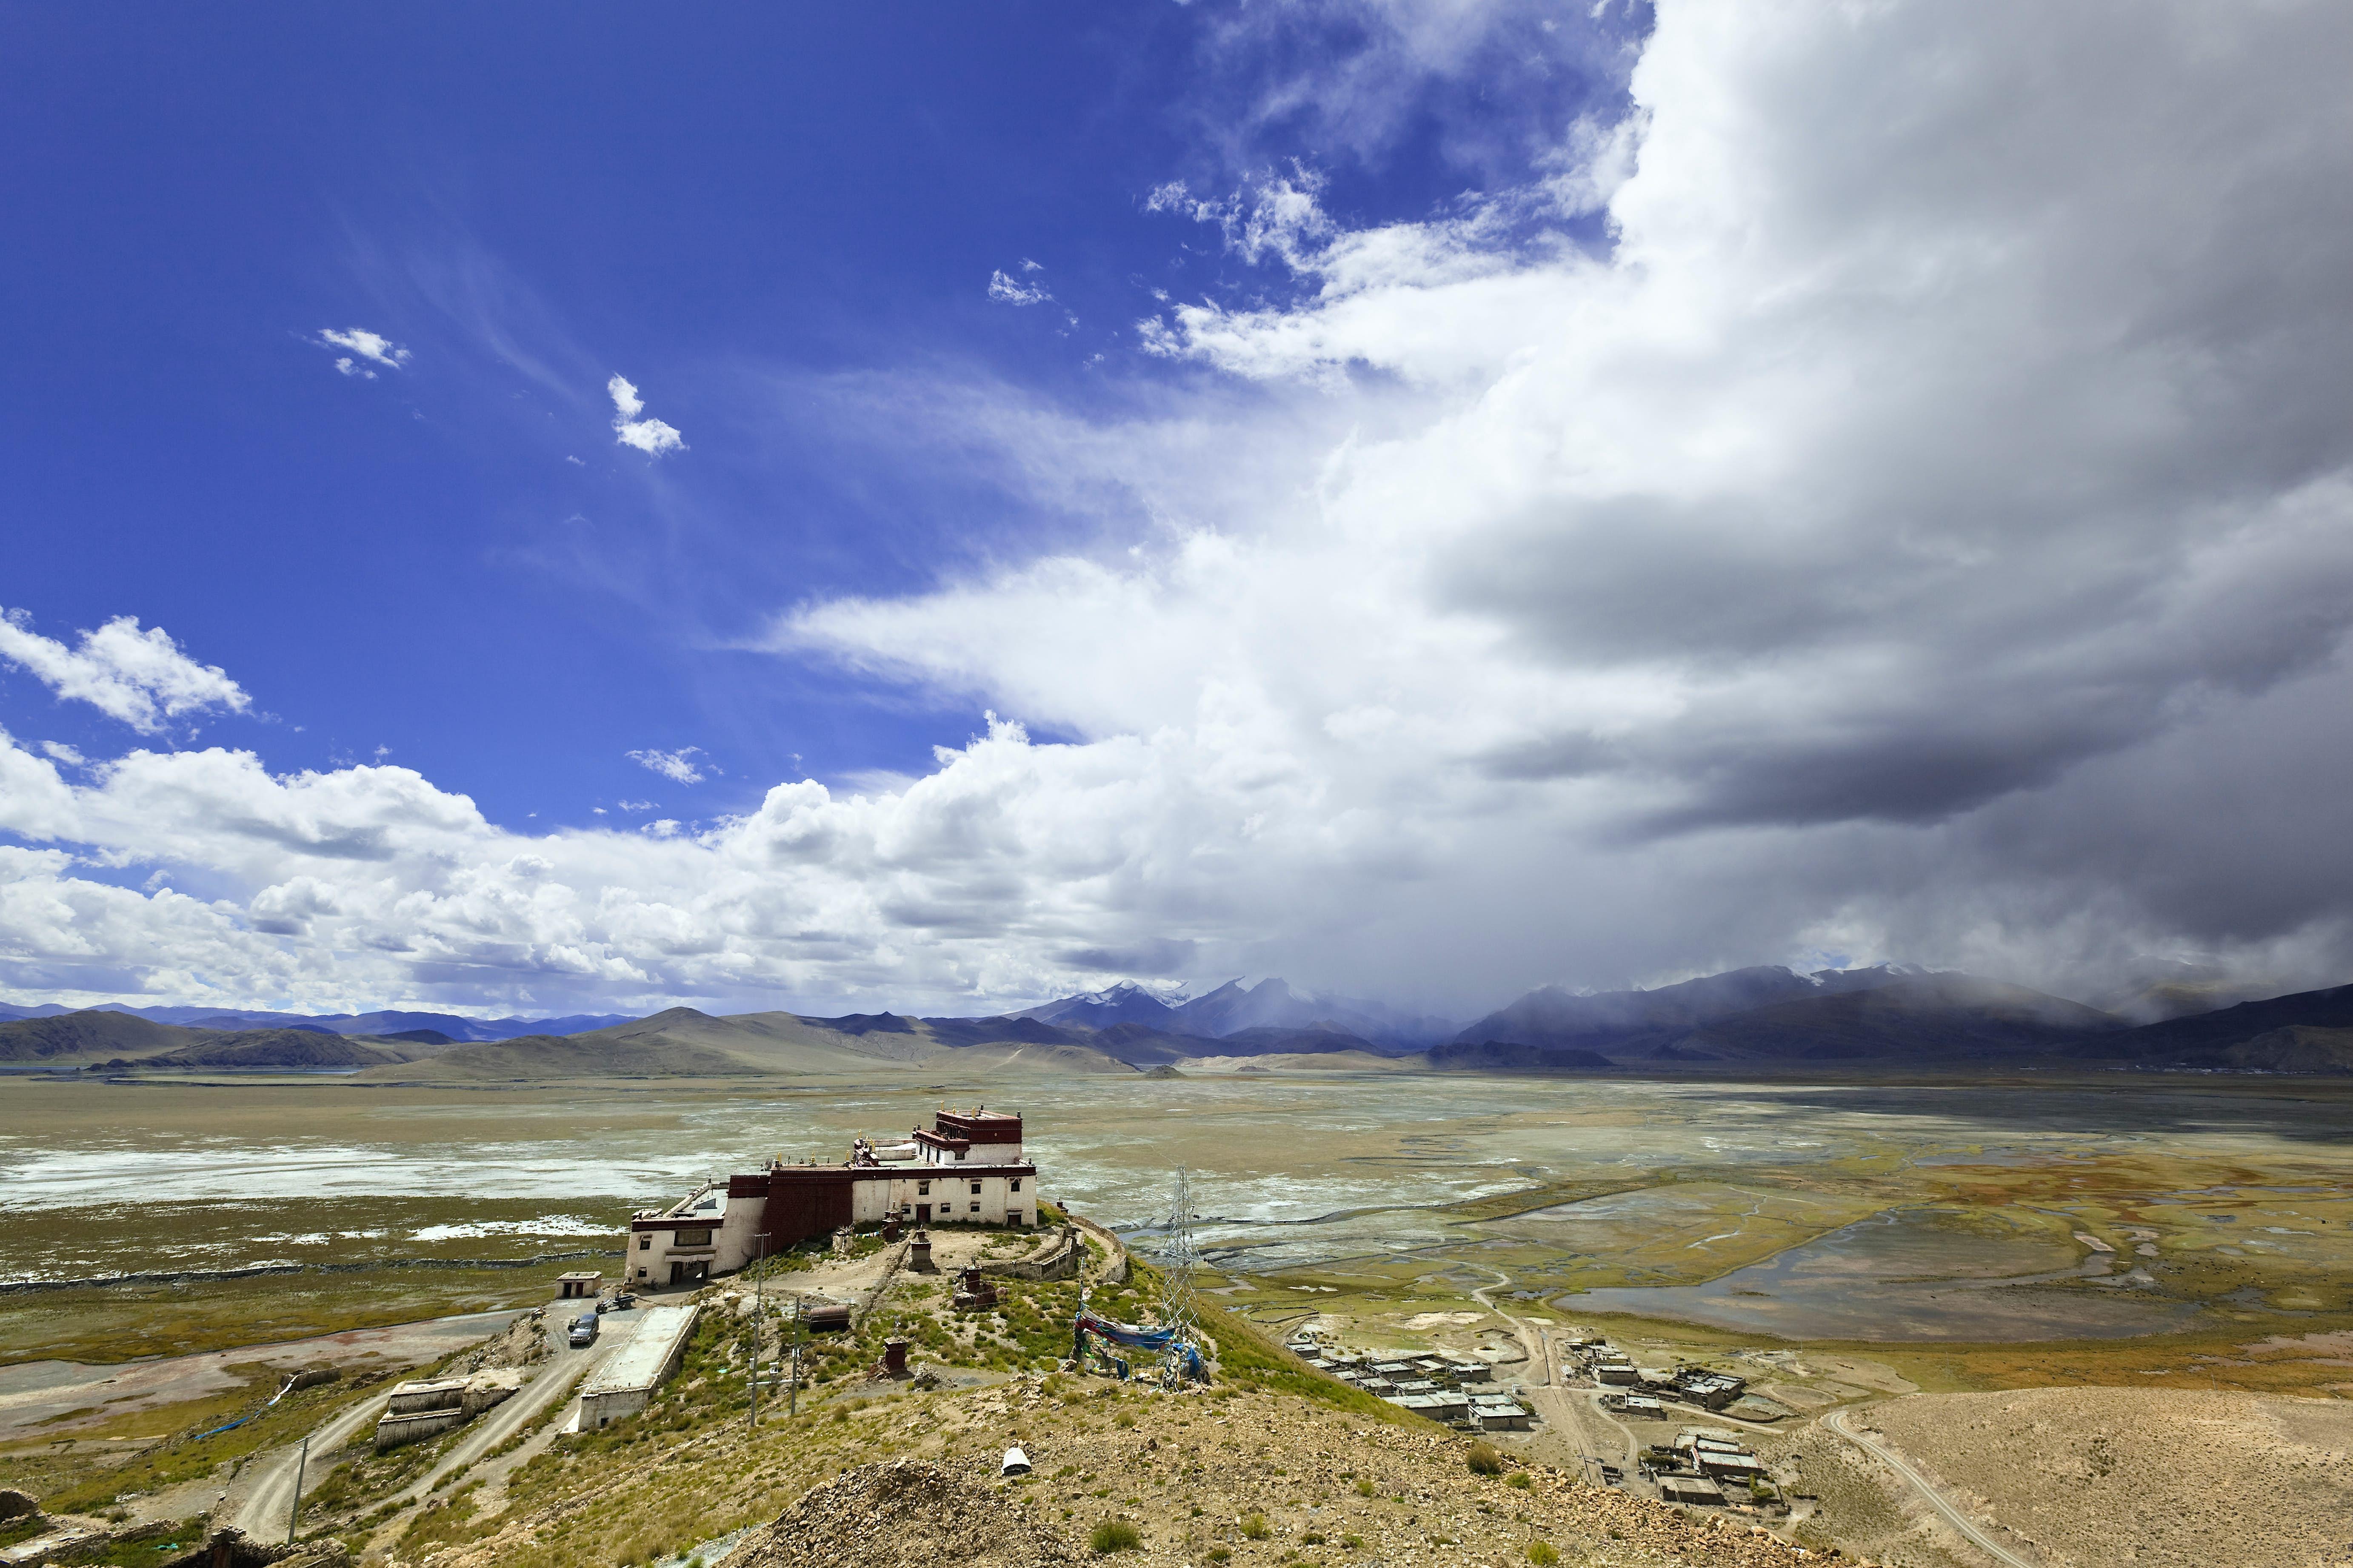 A monastery on a hill.